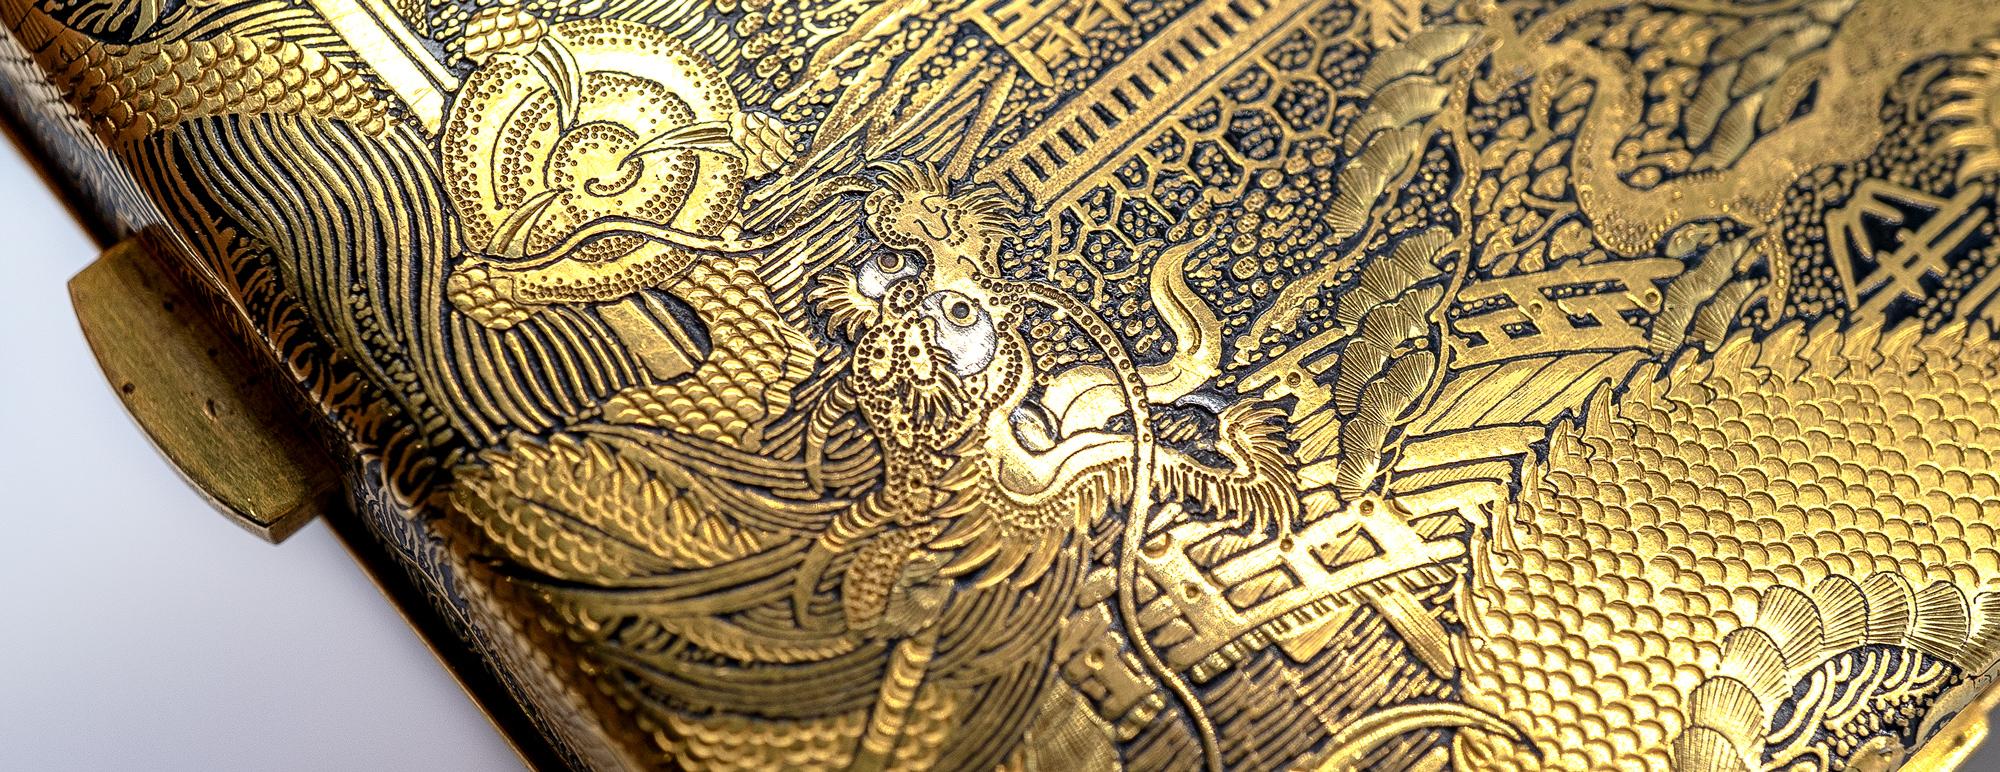 Superb Dragons by Fujii Yoshitoyo